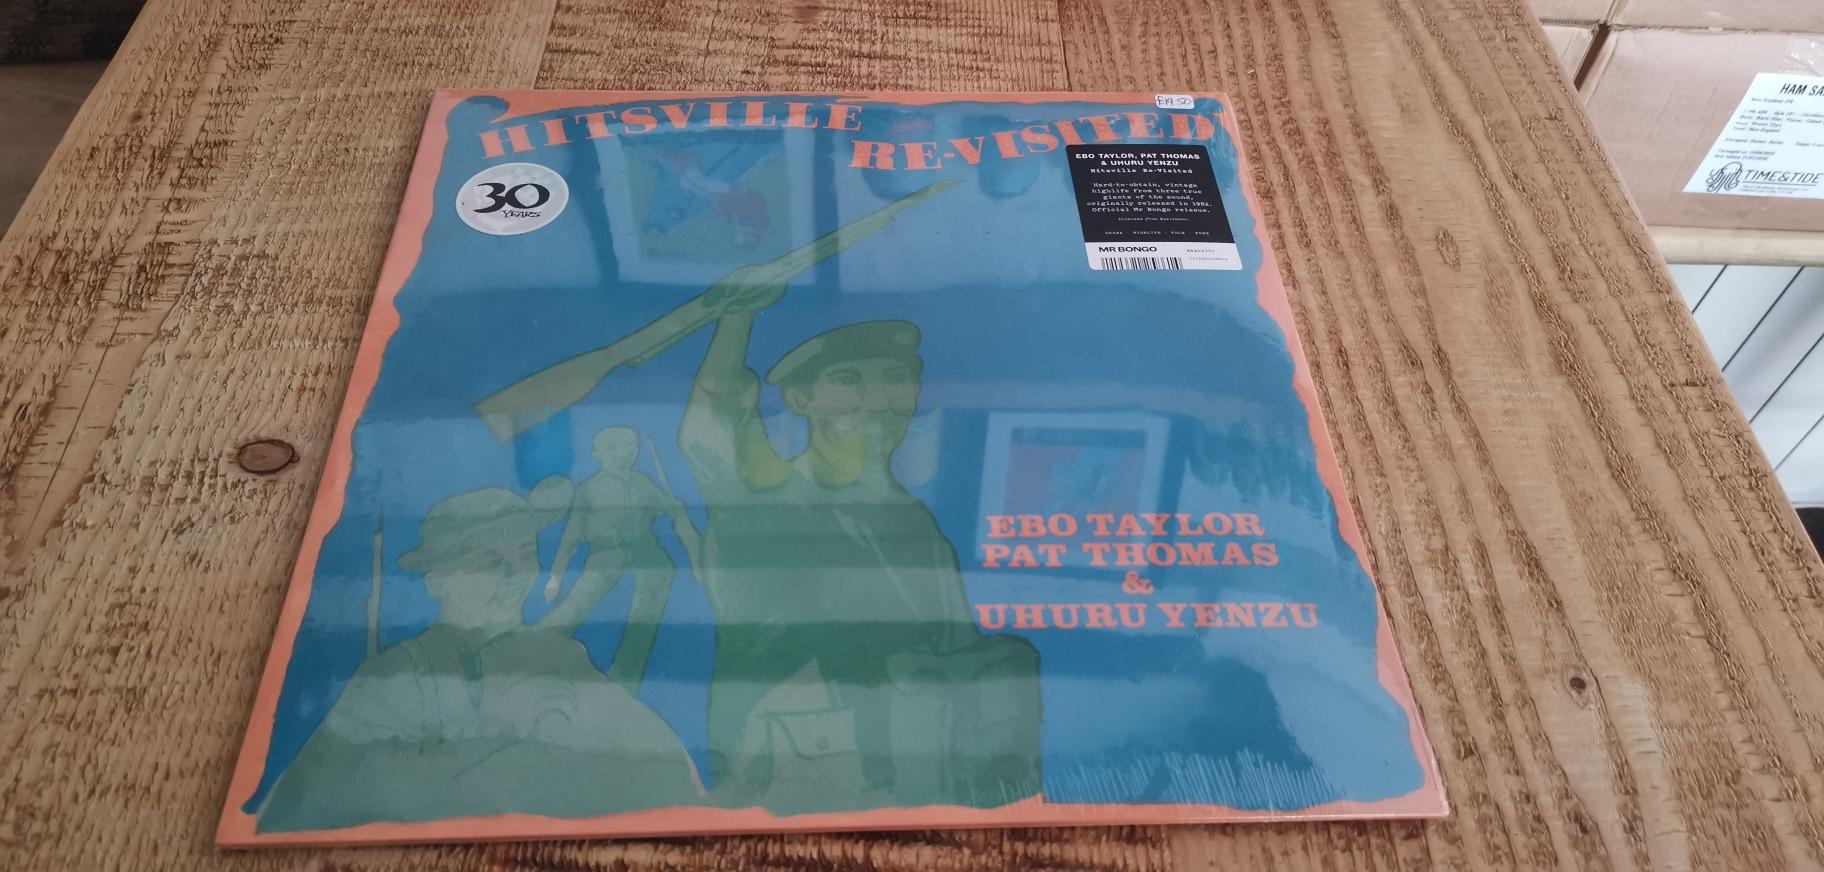 Ebo Taylor, Pat Thomas & Uhuru Yenzu - Hitsville Re-Visited (30th Anniversary)